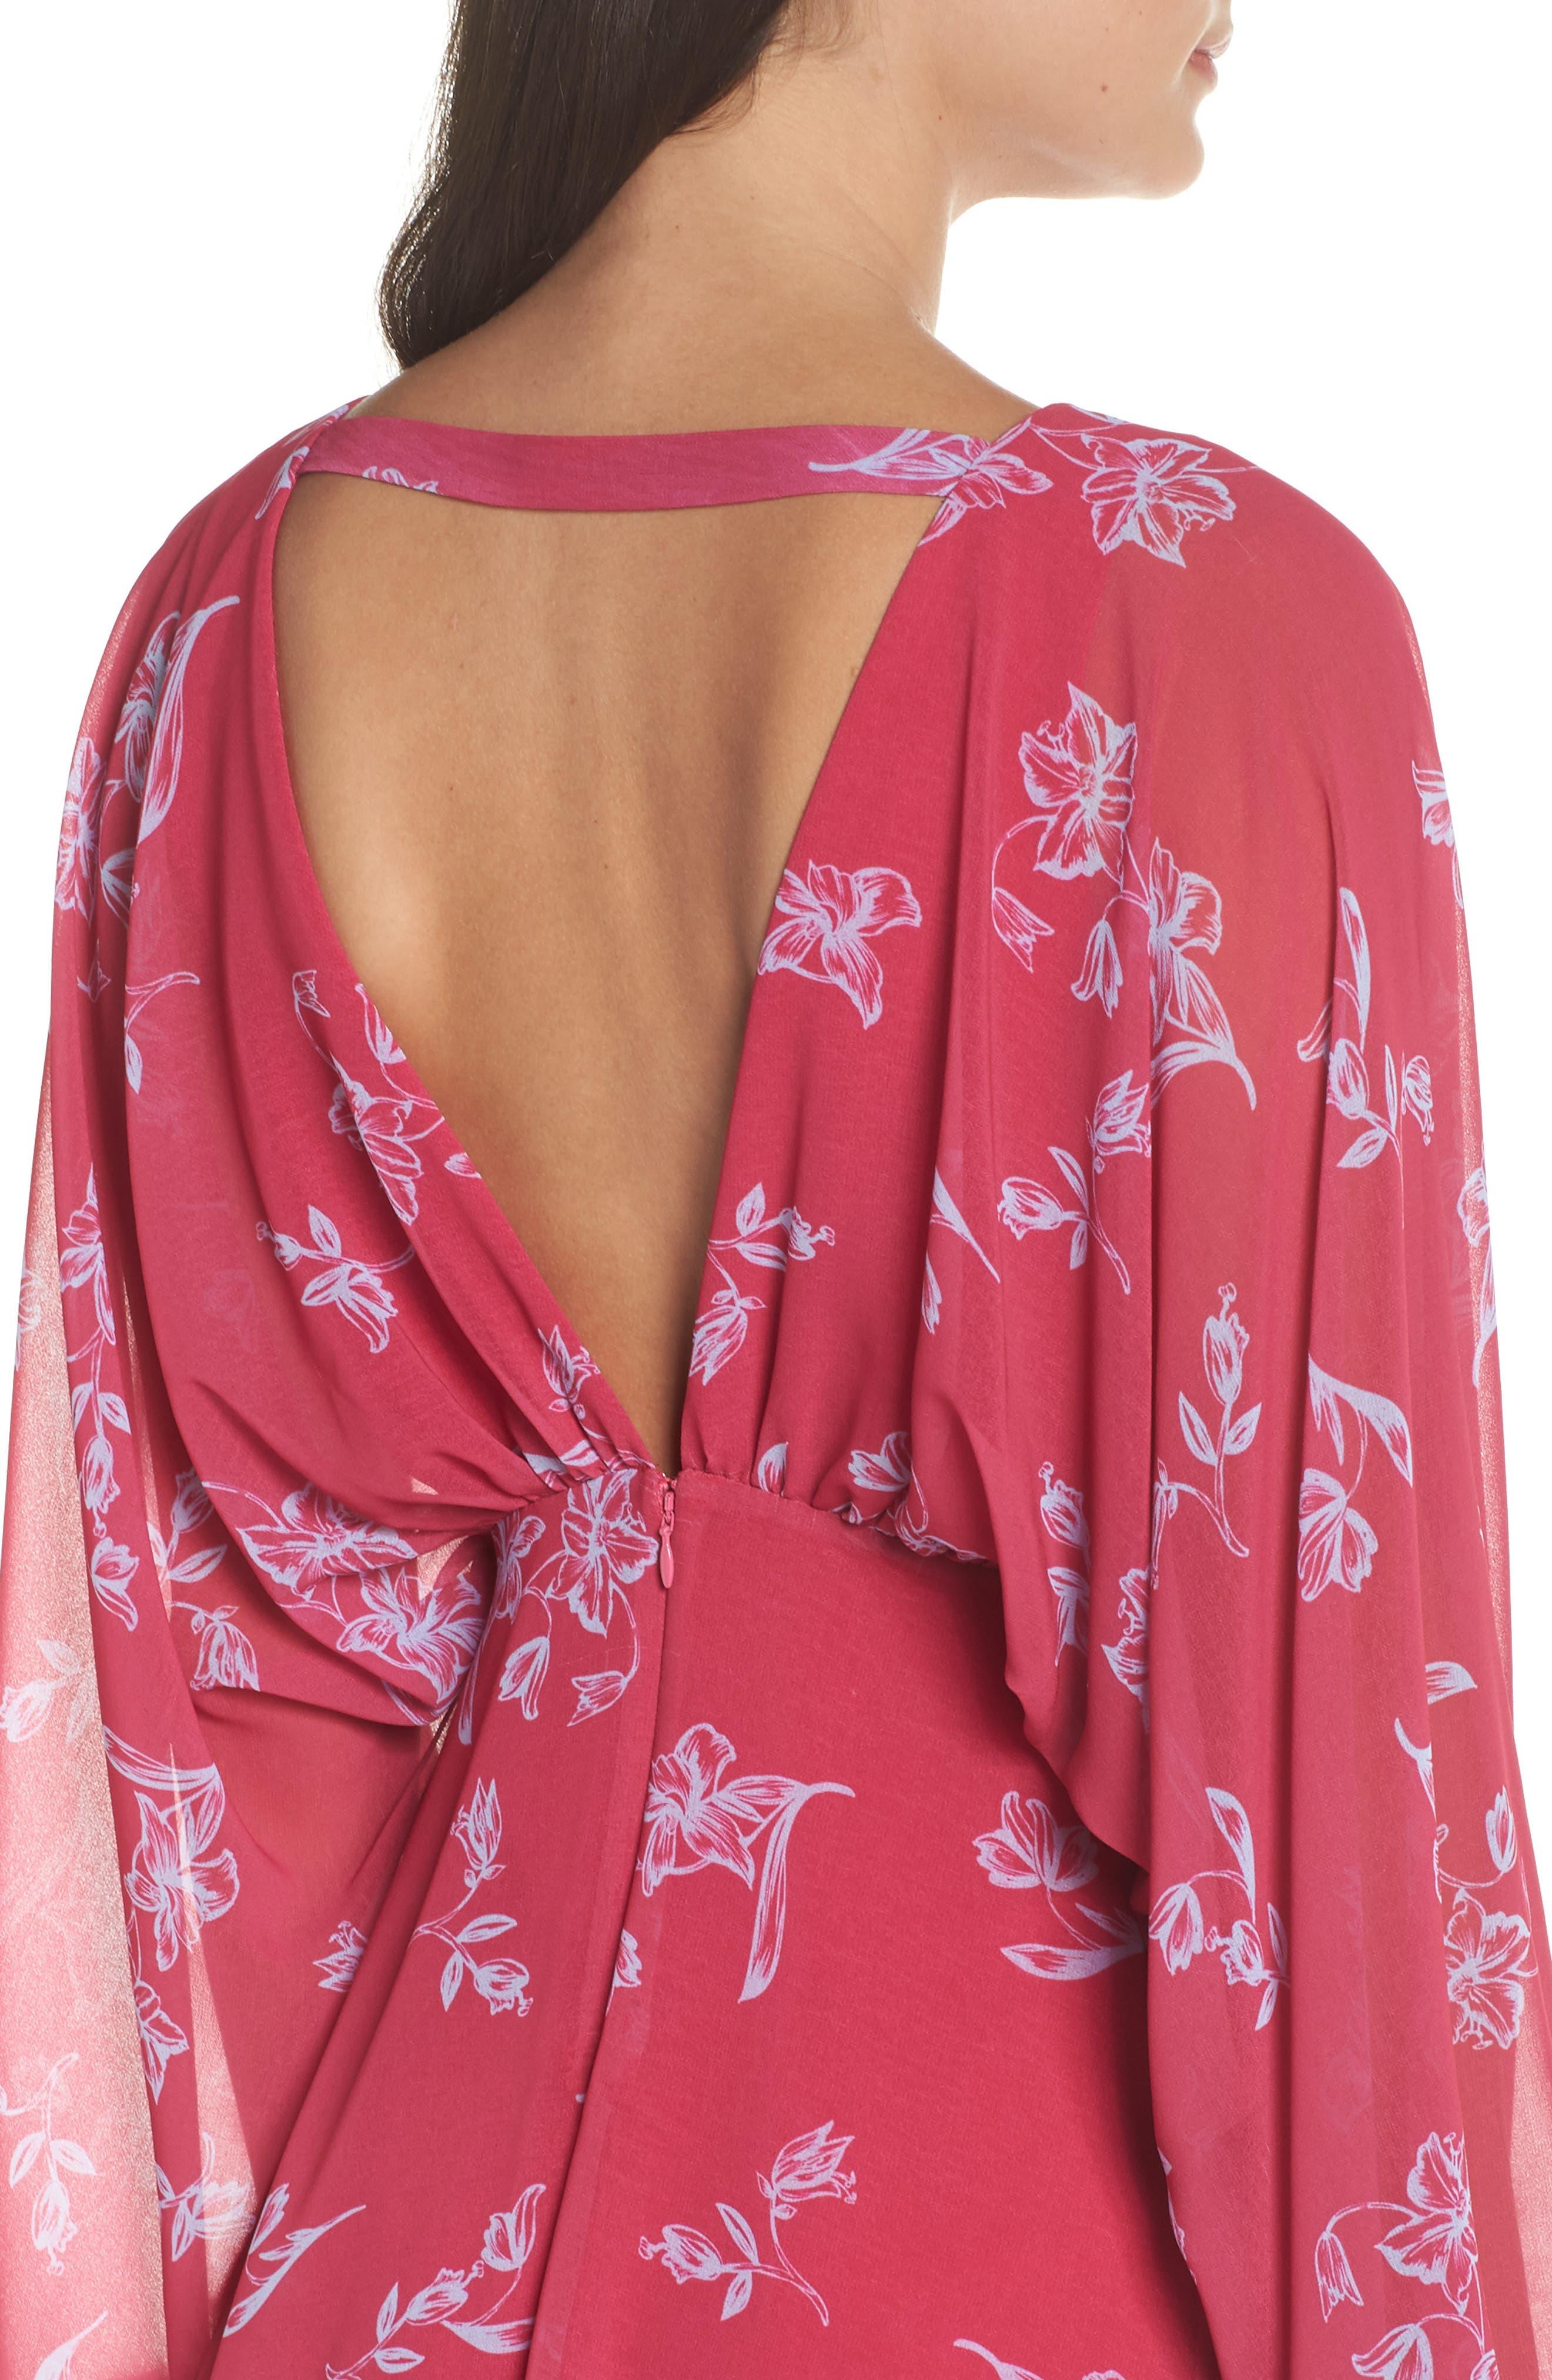 Fame & Partners The Kassidy Georgette Dress,                             Alternate thumbnail 4, color,                             Pop Sketch Floral